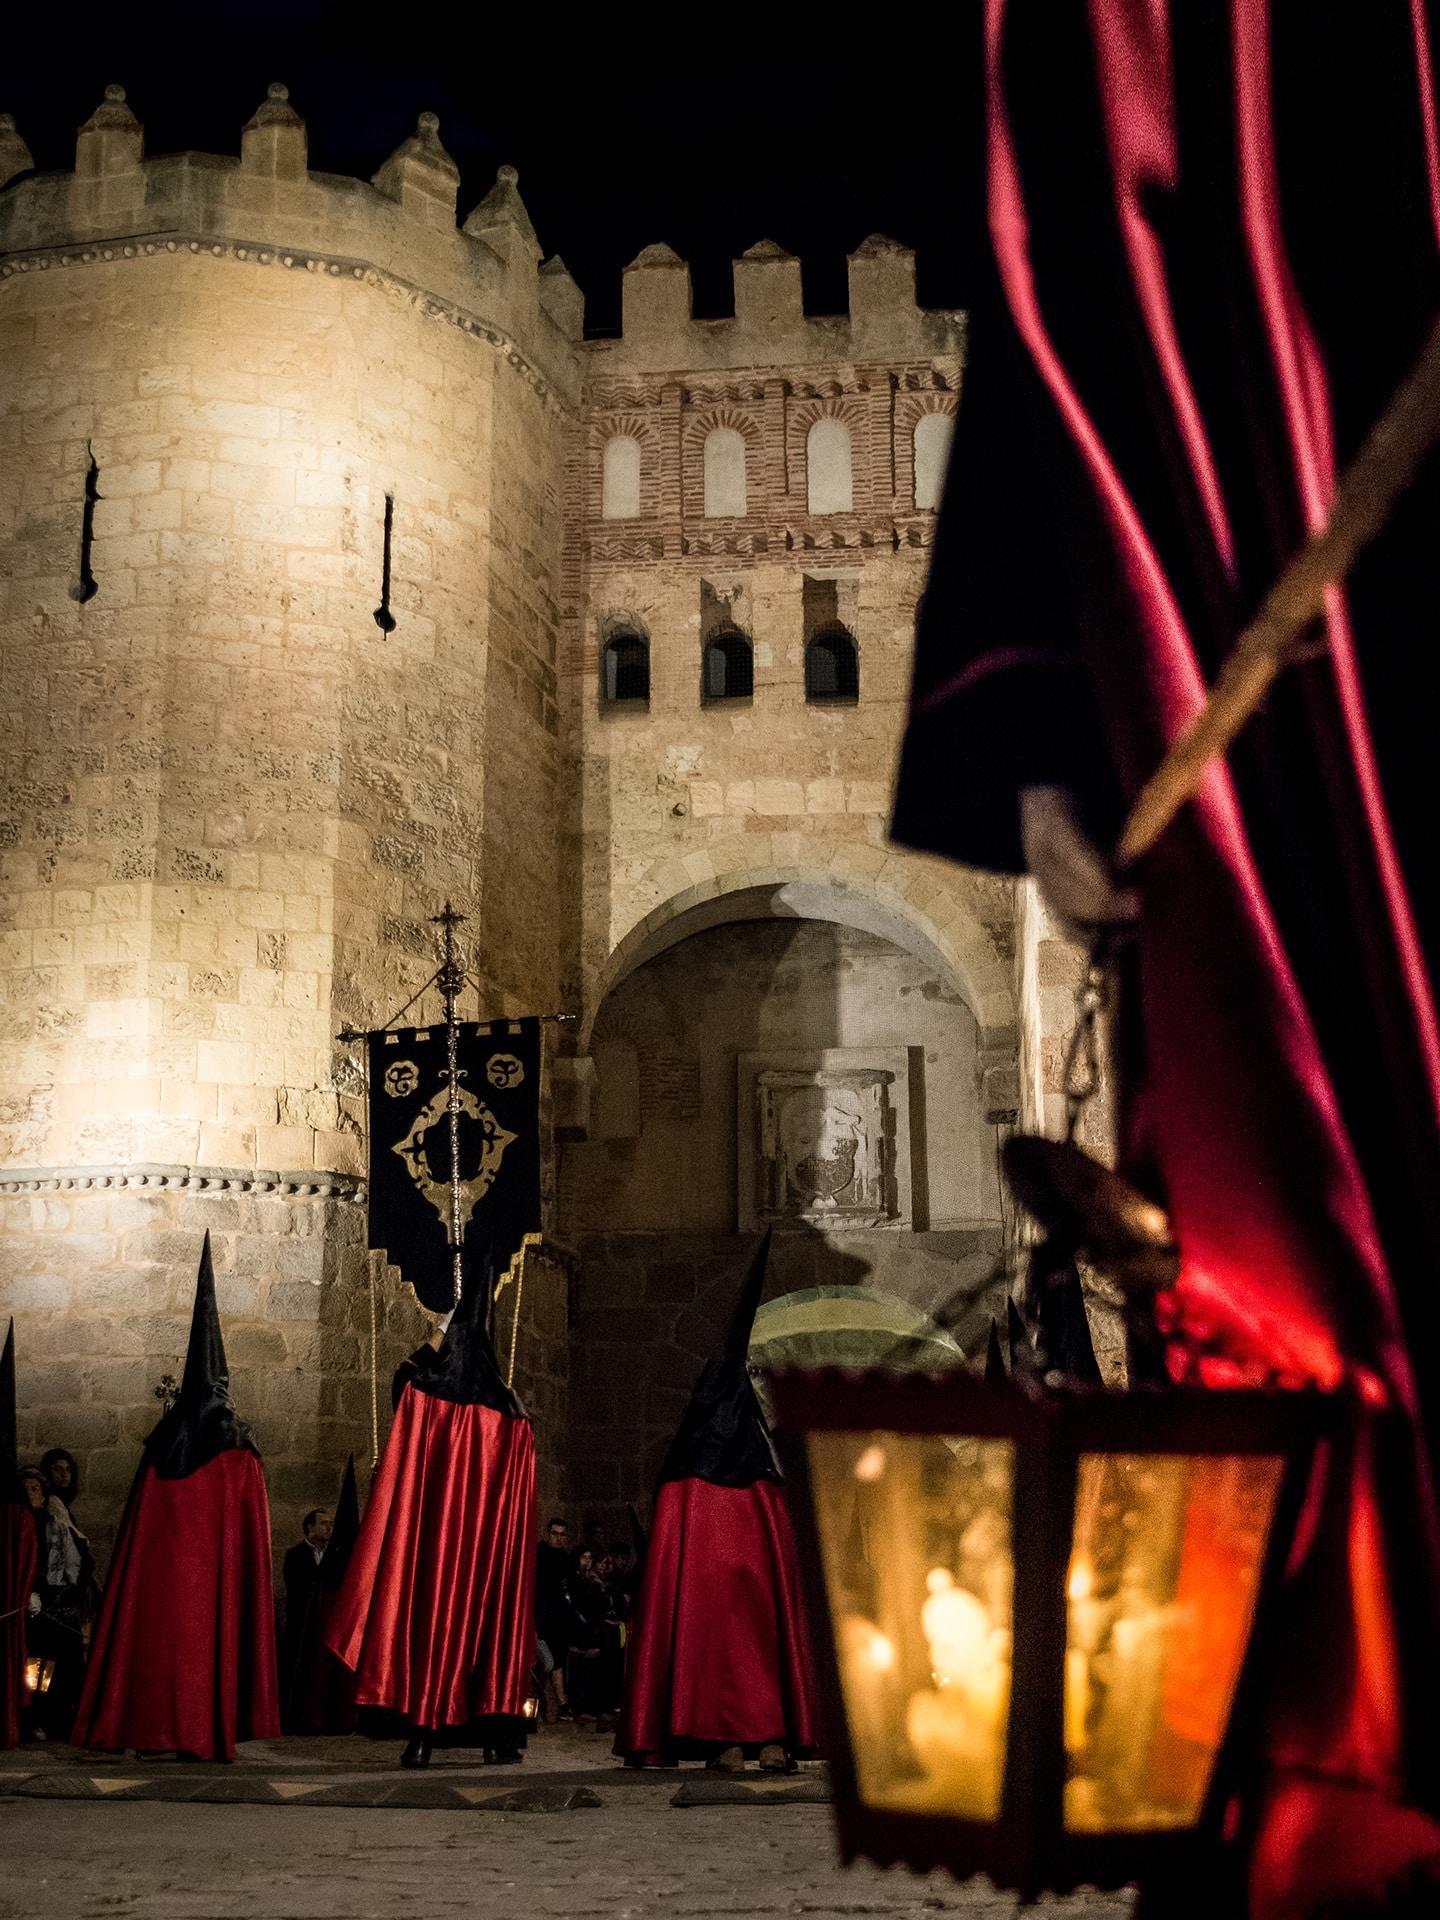 nazarenos de ADEMAR, arco del socorro, jueves santo, Segovia (Manu Rodrigo)